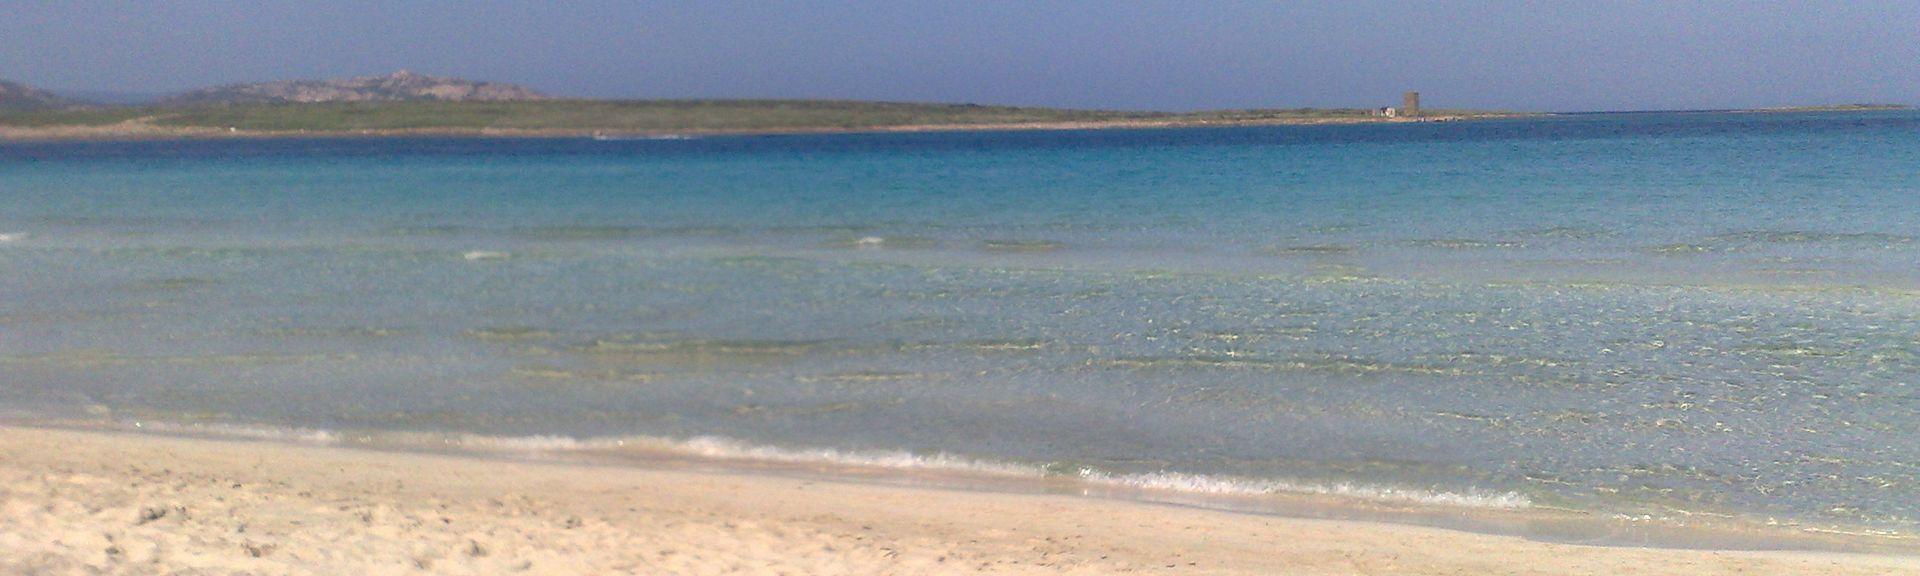 Spiaggia di Platamona, Platamona, Sardegna, Italia